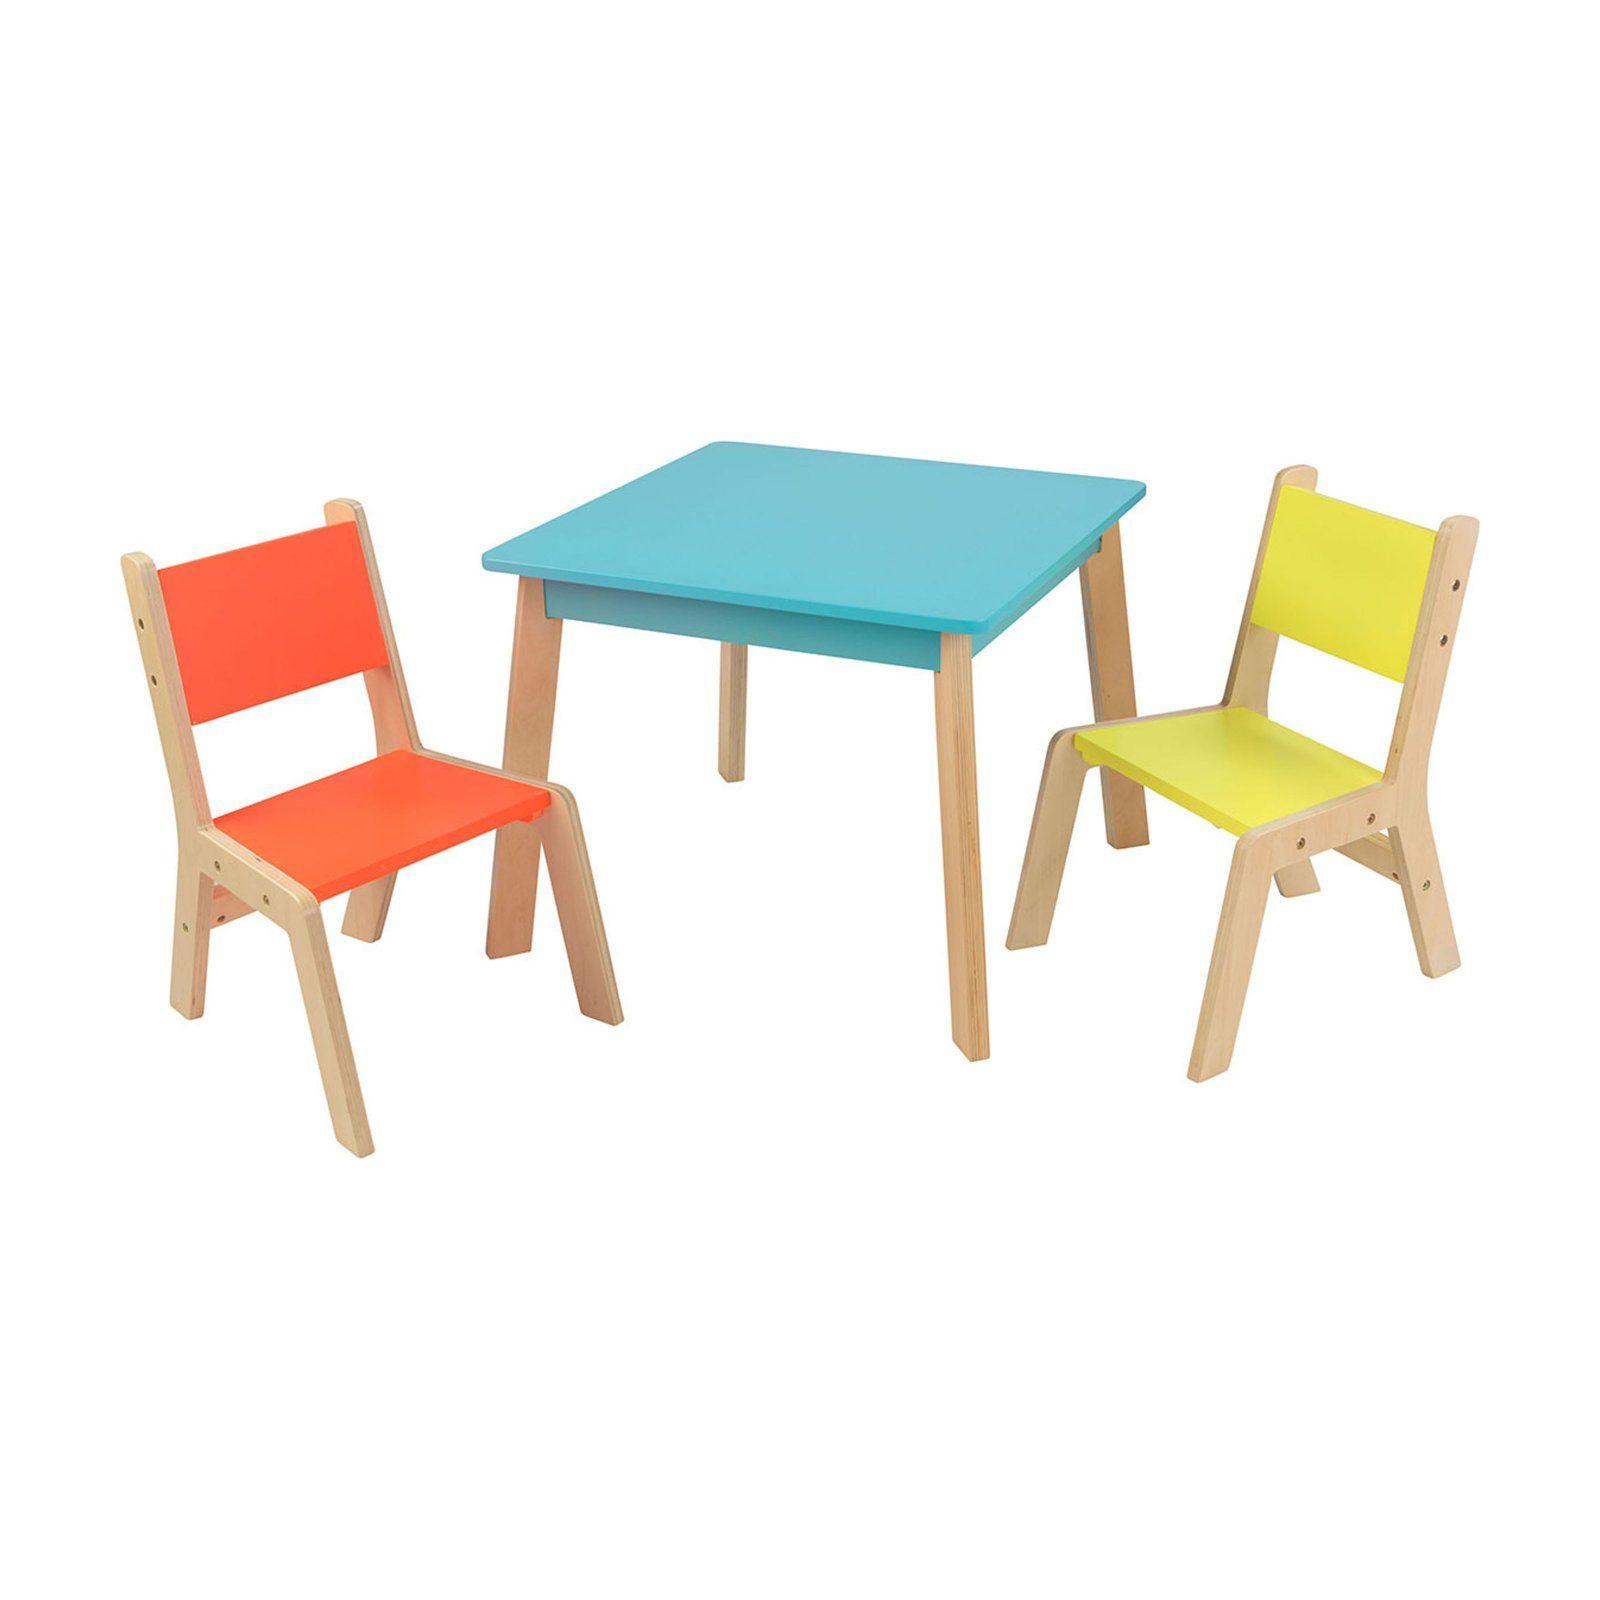 Kidkraft Modern 3 Piece Table And Chair Set Modern Table And Chairs Desk And Chair Set Toddler Table